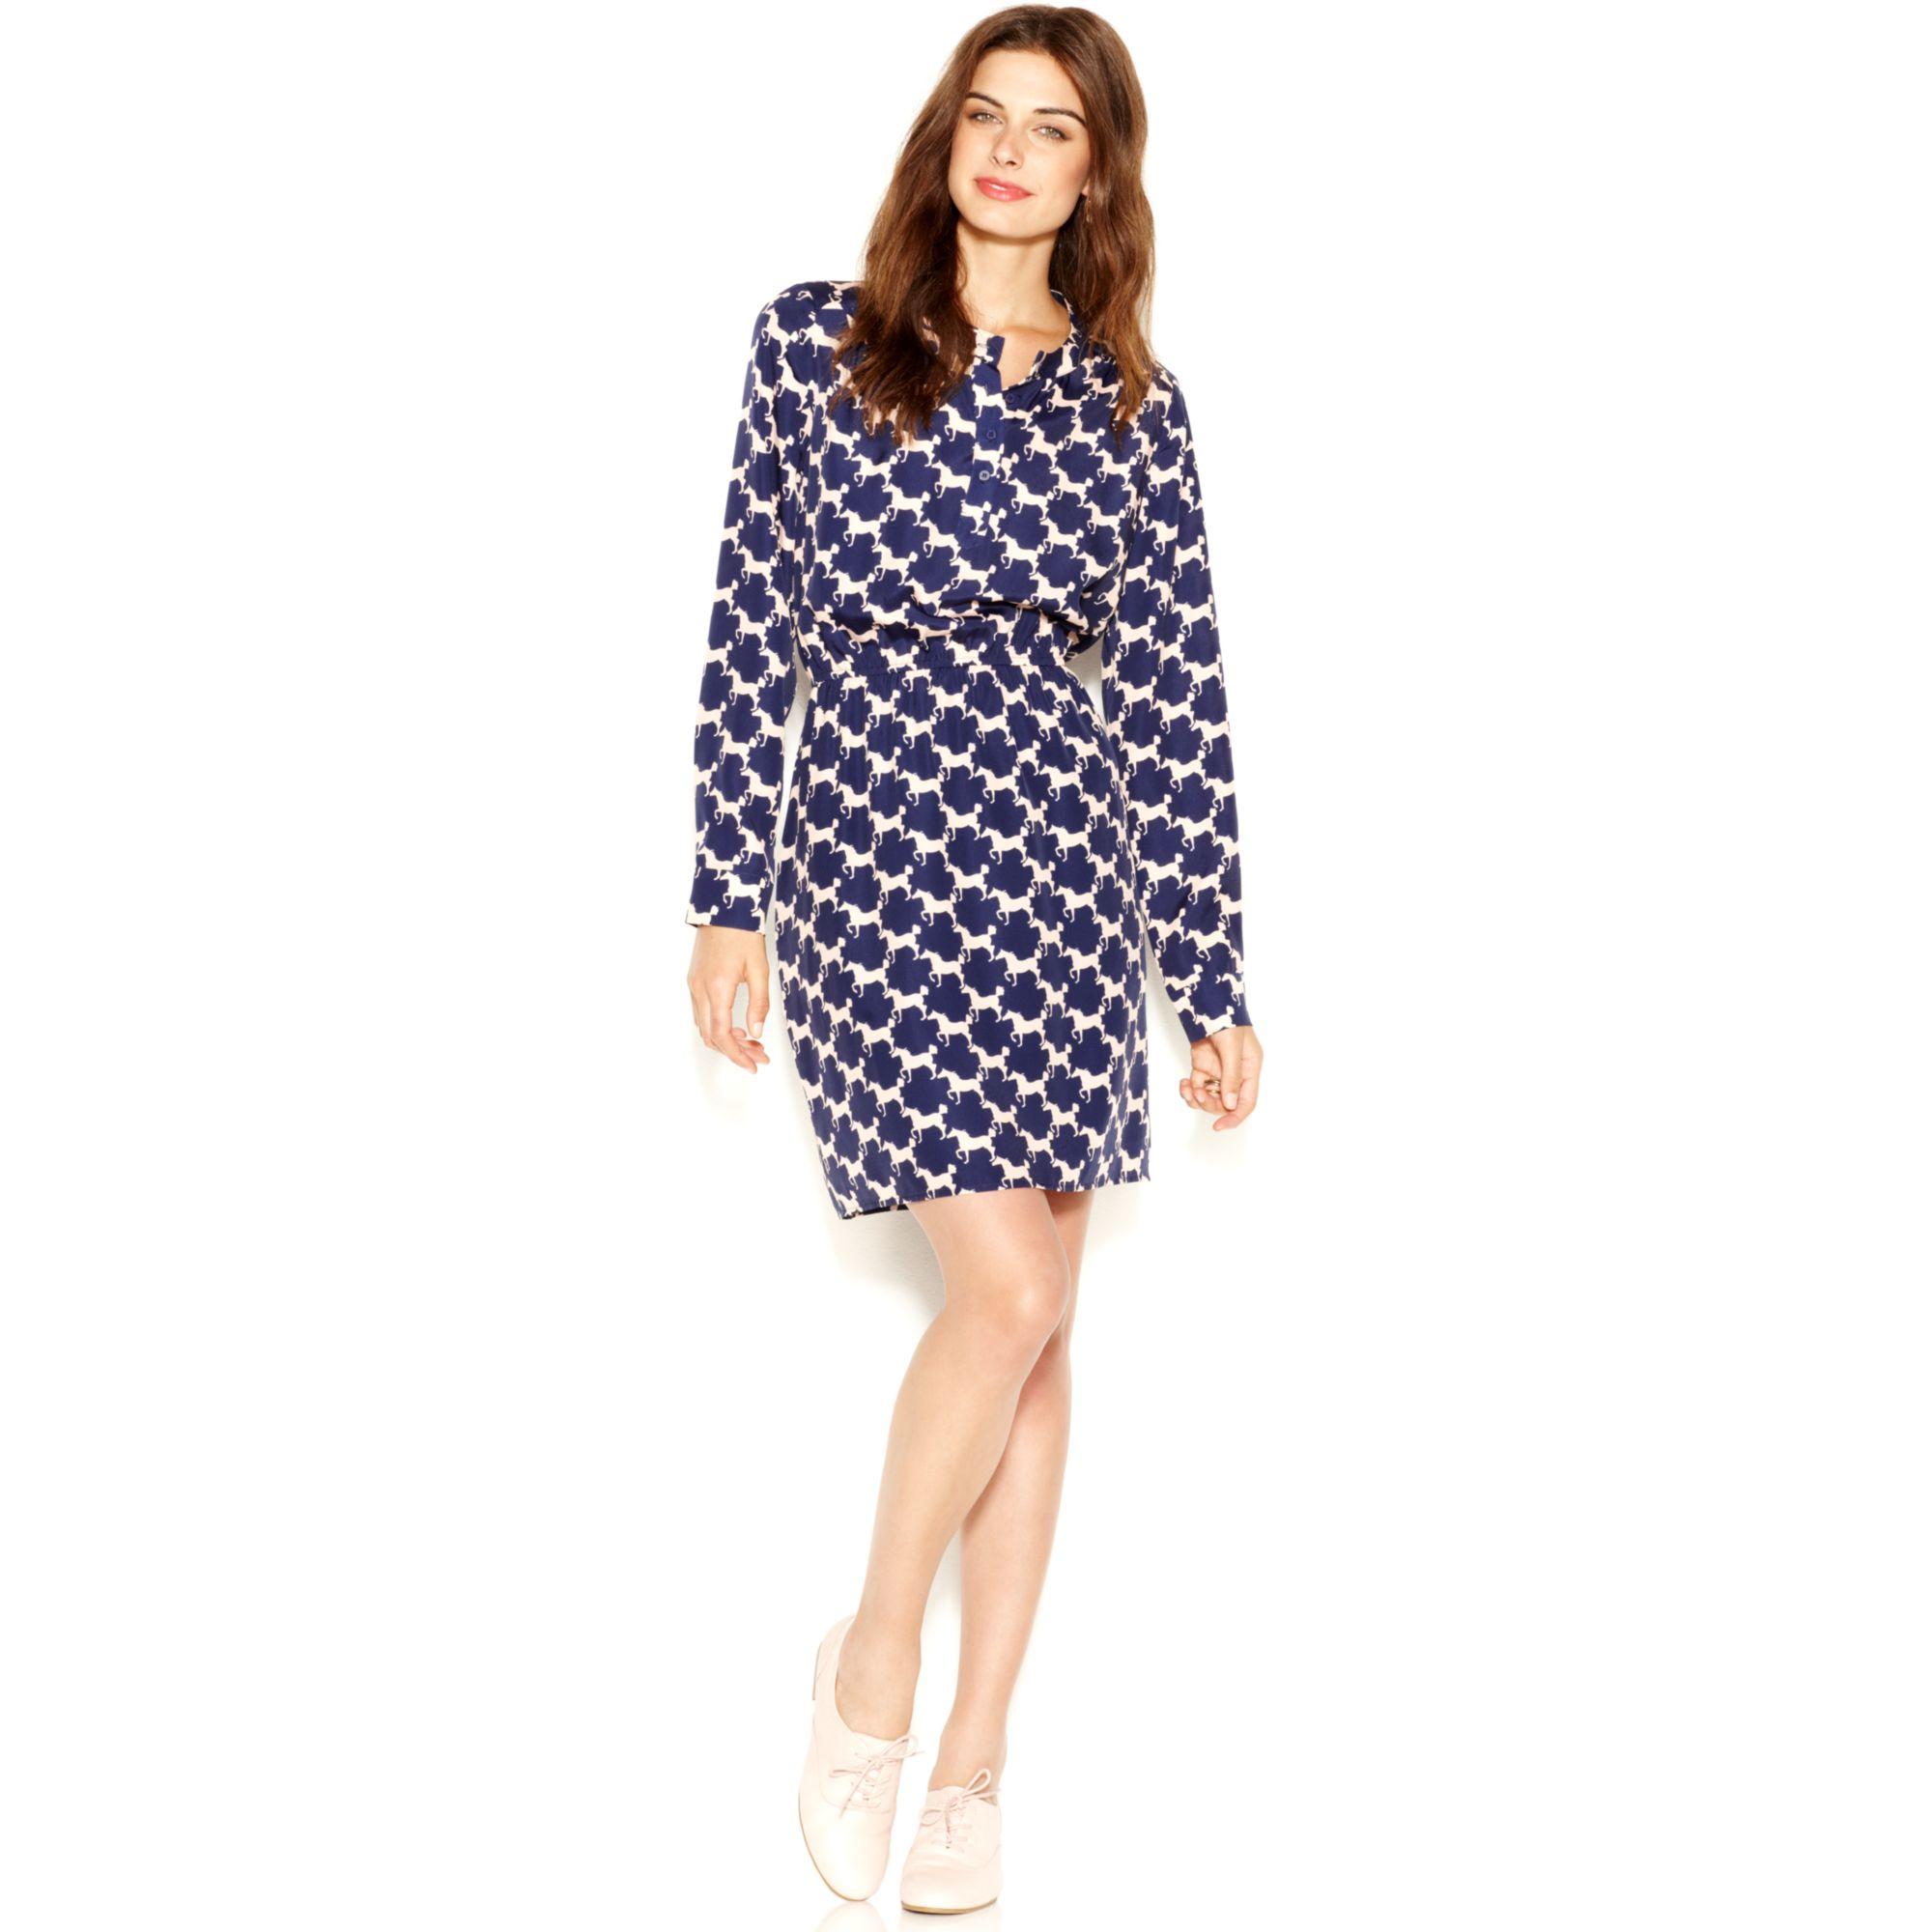 Maison Jules Banded Collar Horsetooth Print Shirt Dress In